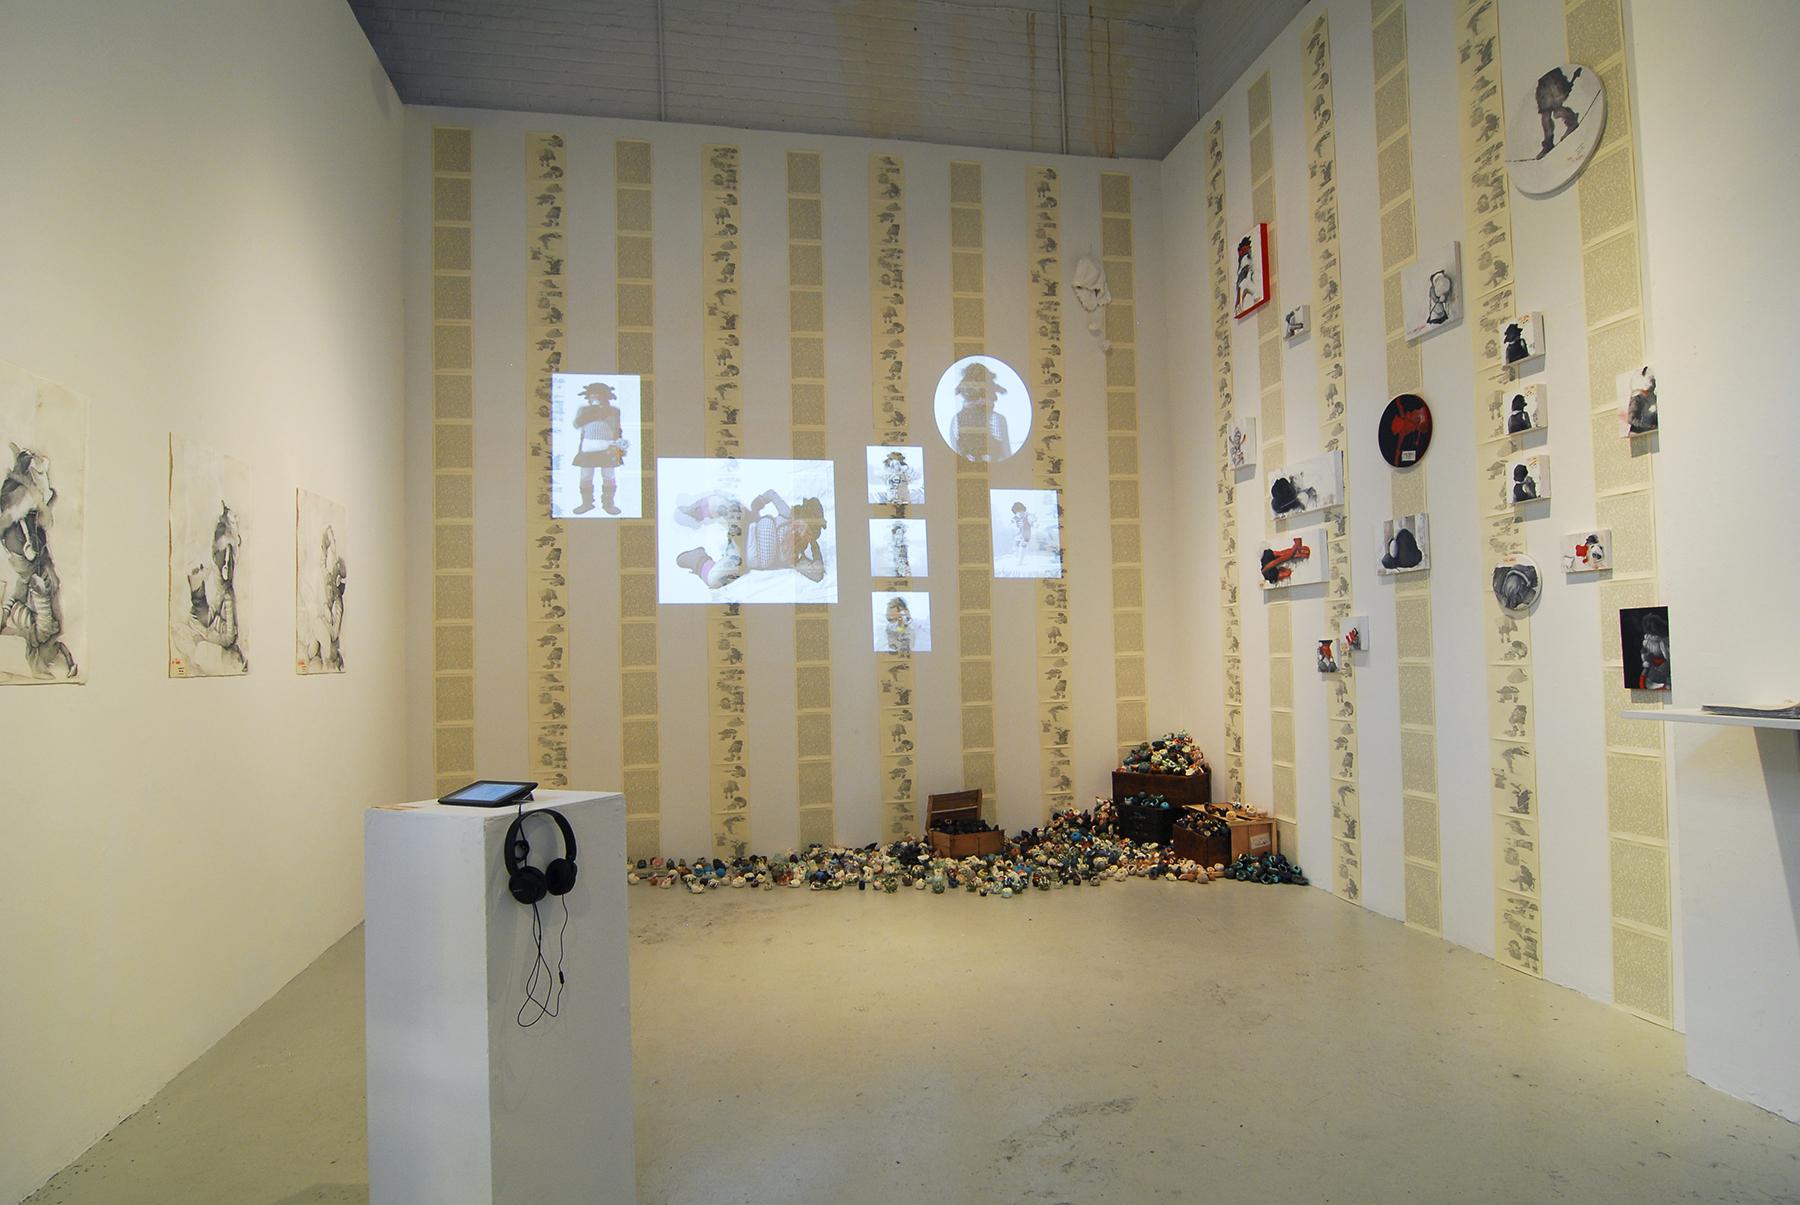 2014 Cuchifritos Gallery.Photos by Samantha Wrigglesworth